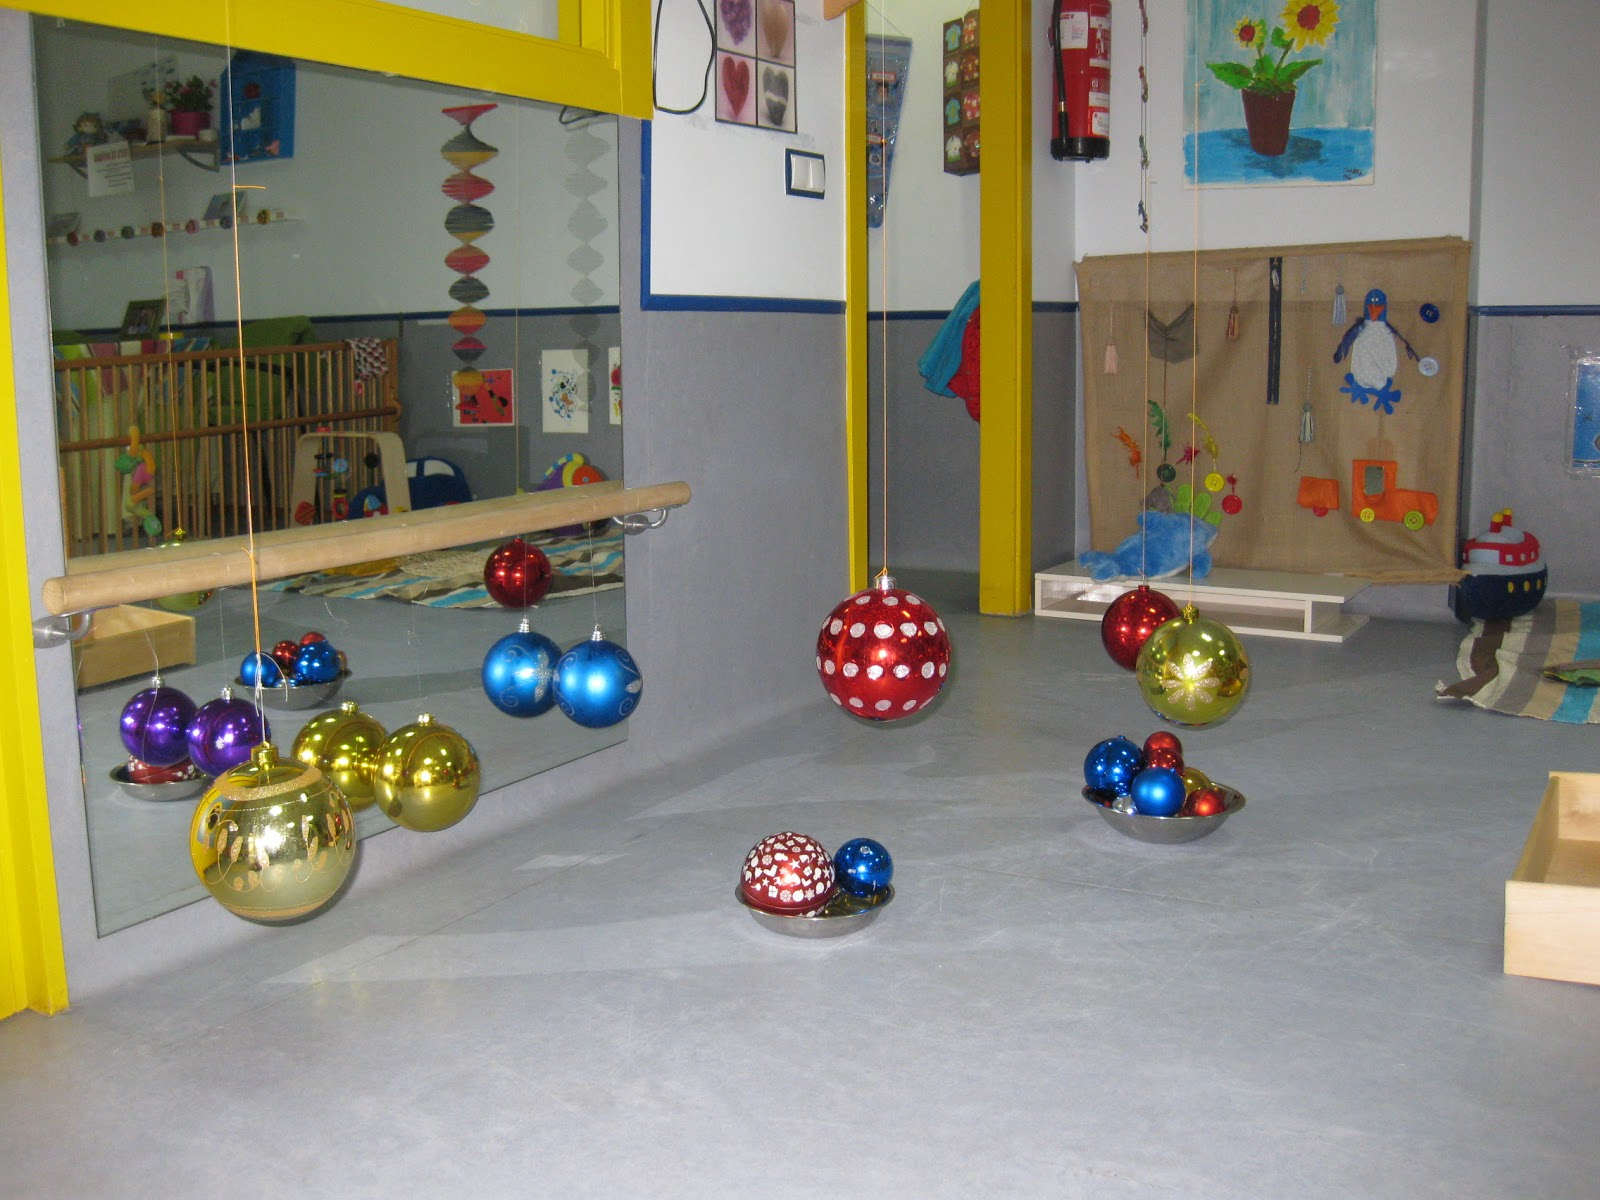 Aprendiendo a ser madre mi rcoles mudo decoraci n for Decoracion navidena infantil